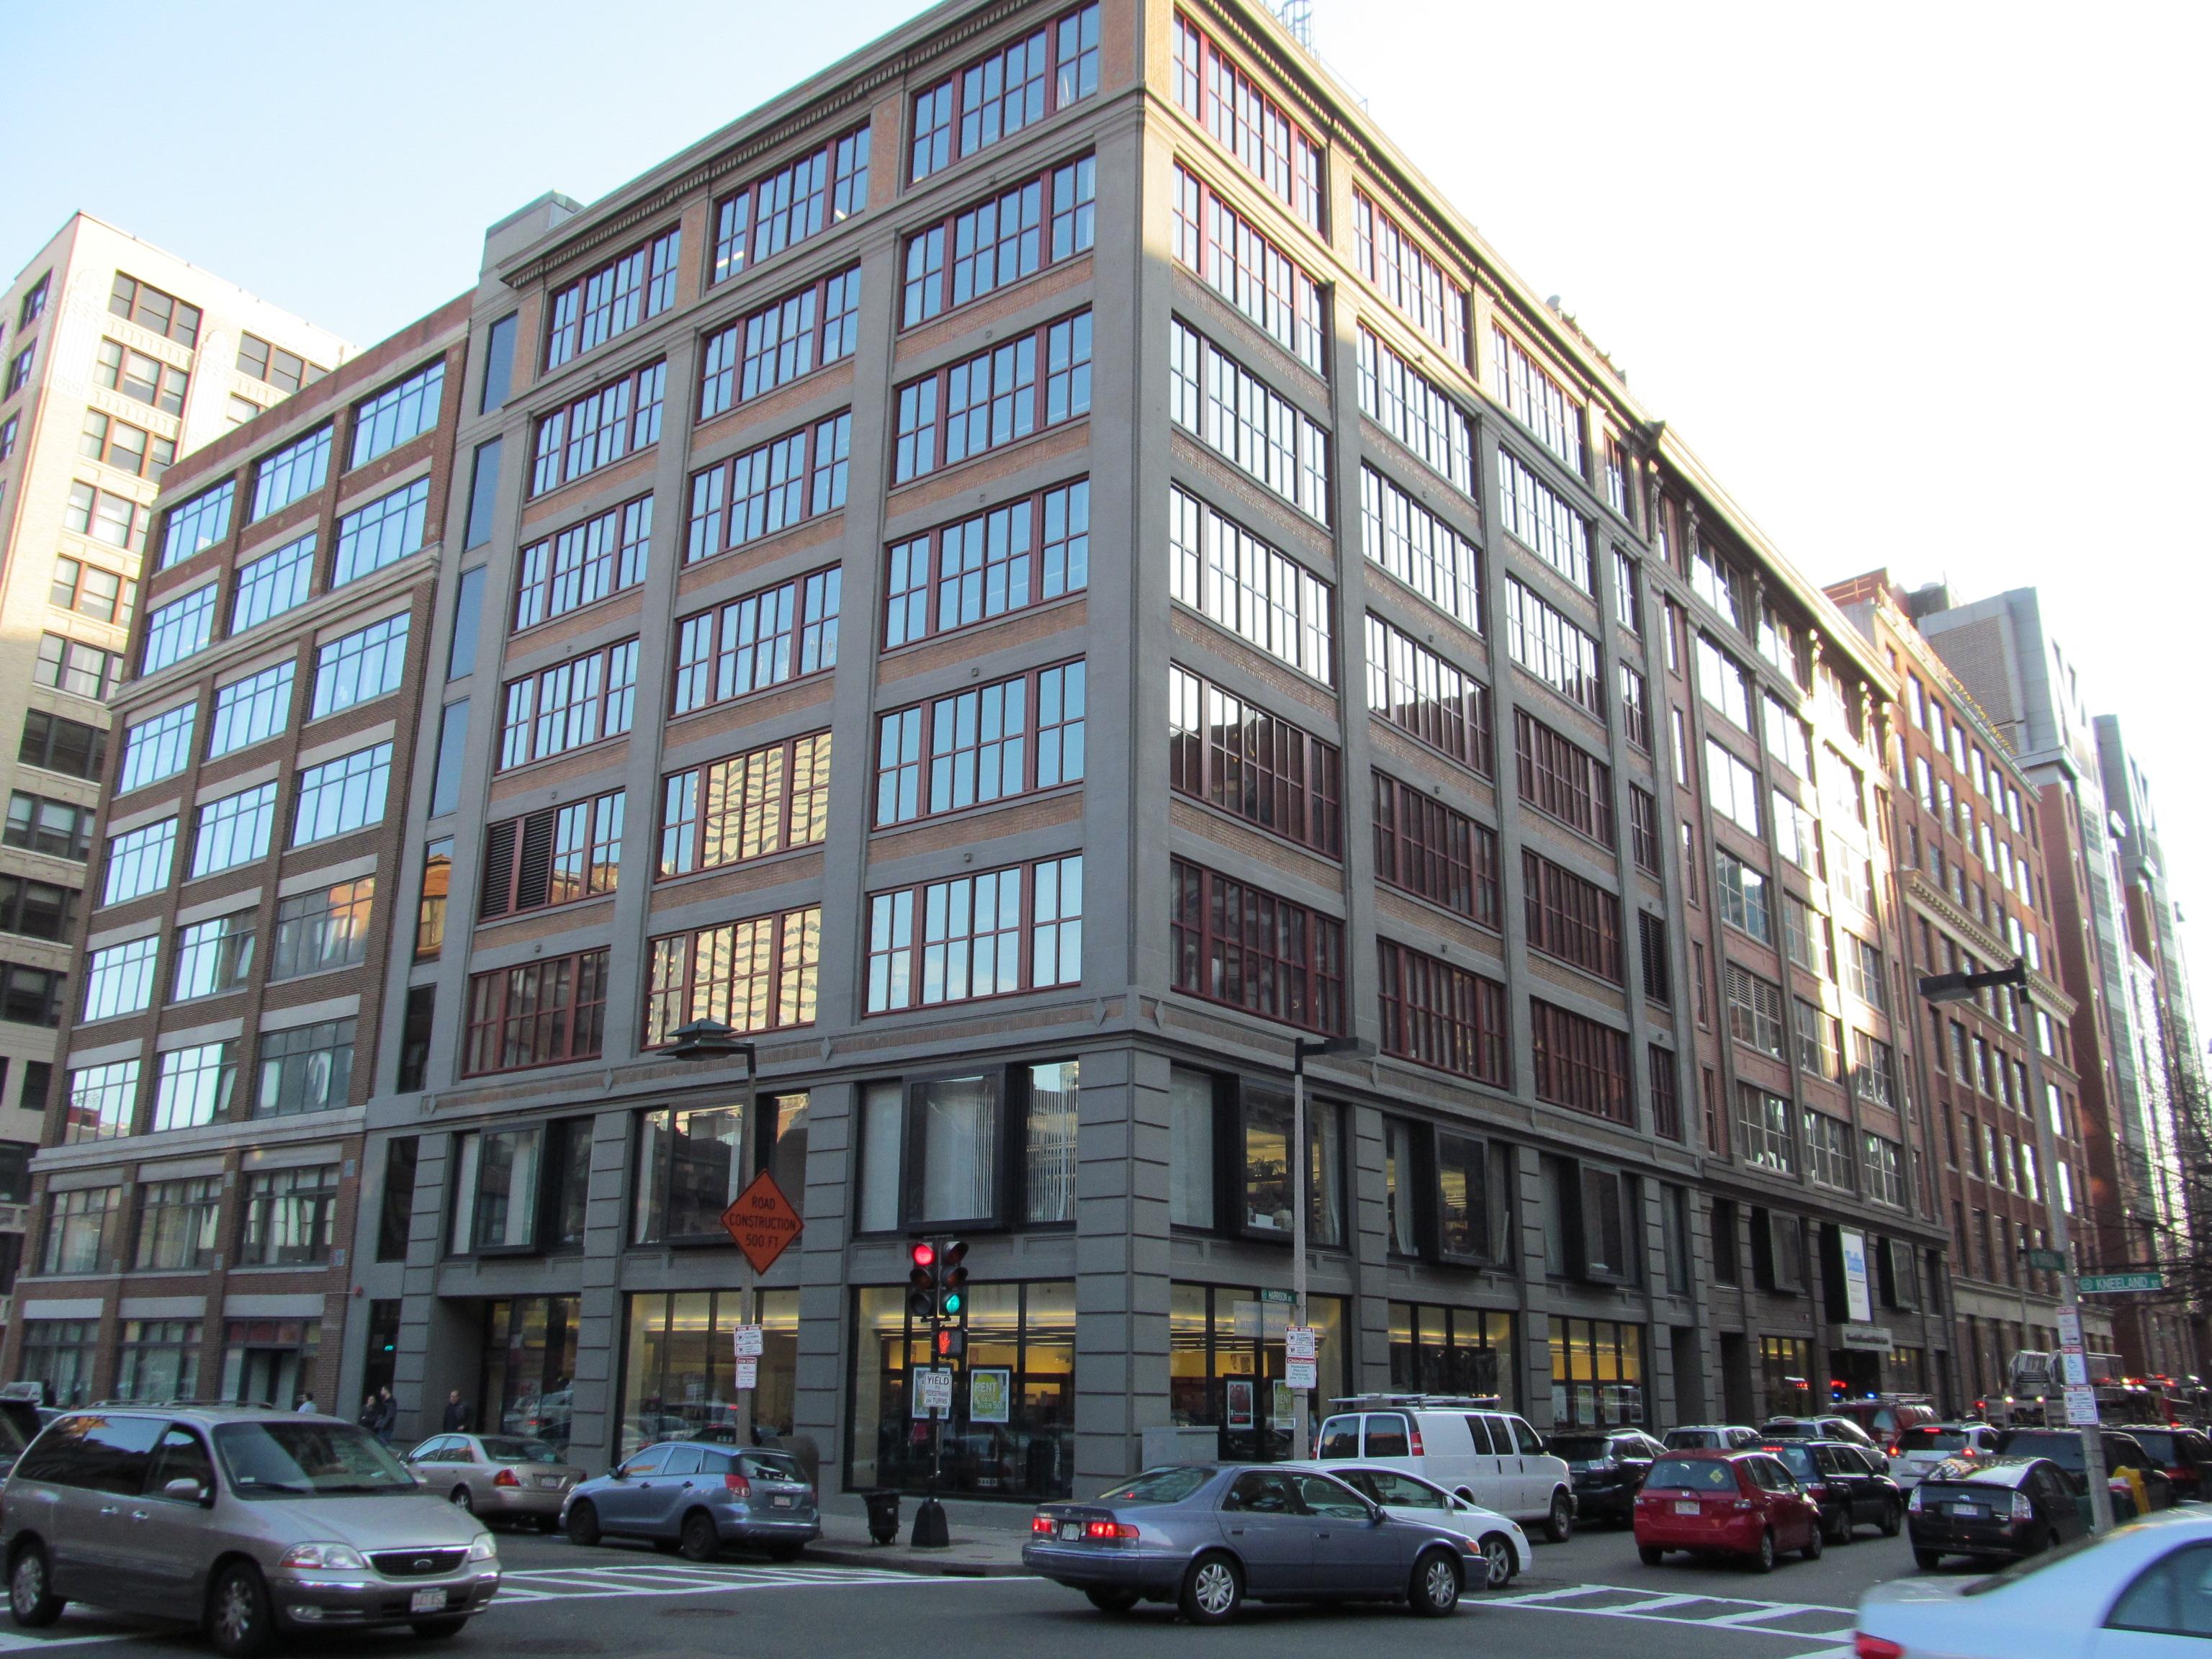 Tufts University School of Medicine - Wikipedia